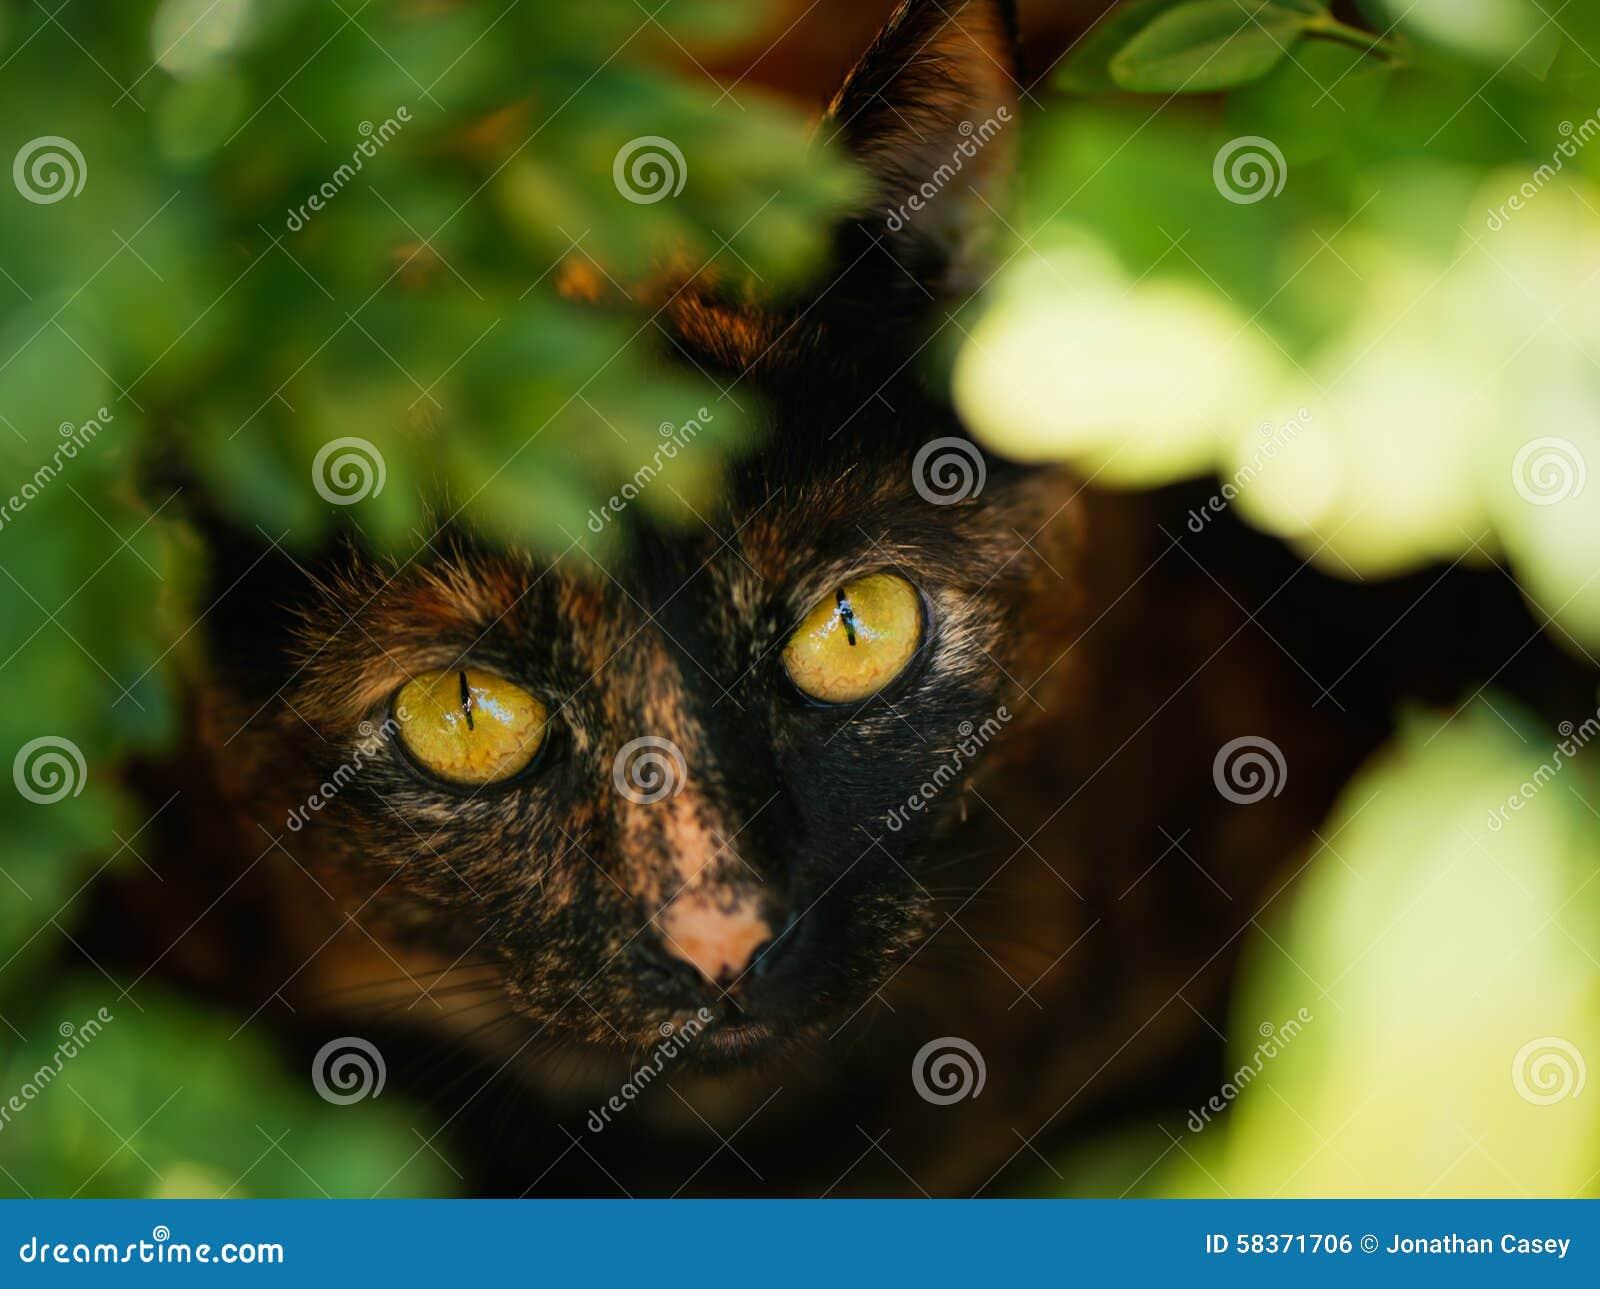 Tortoiseshell Cat in Foliage